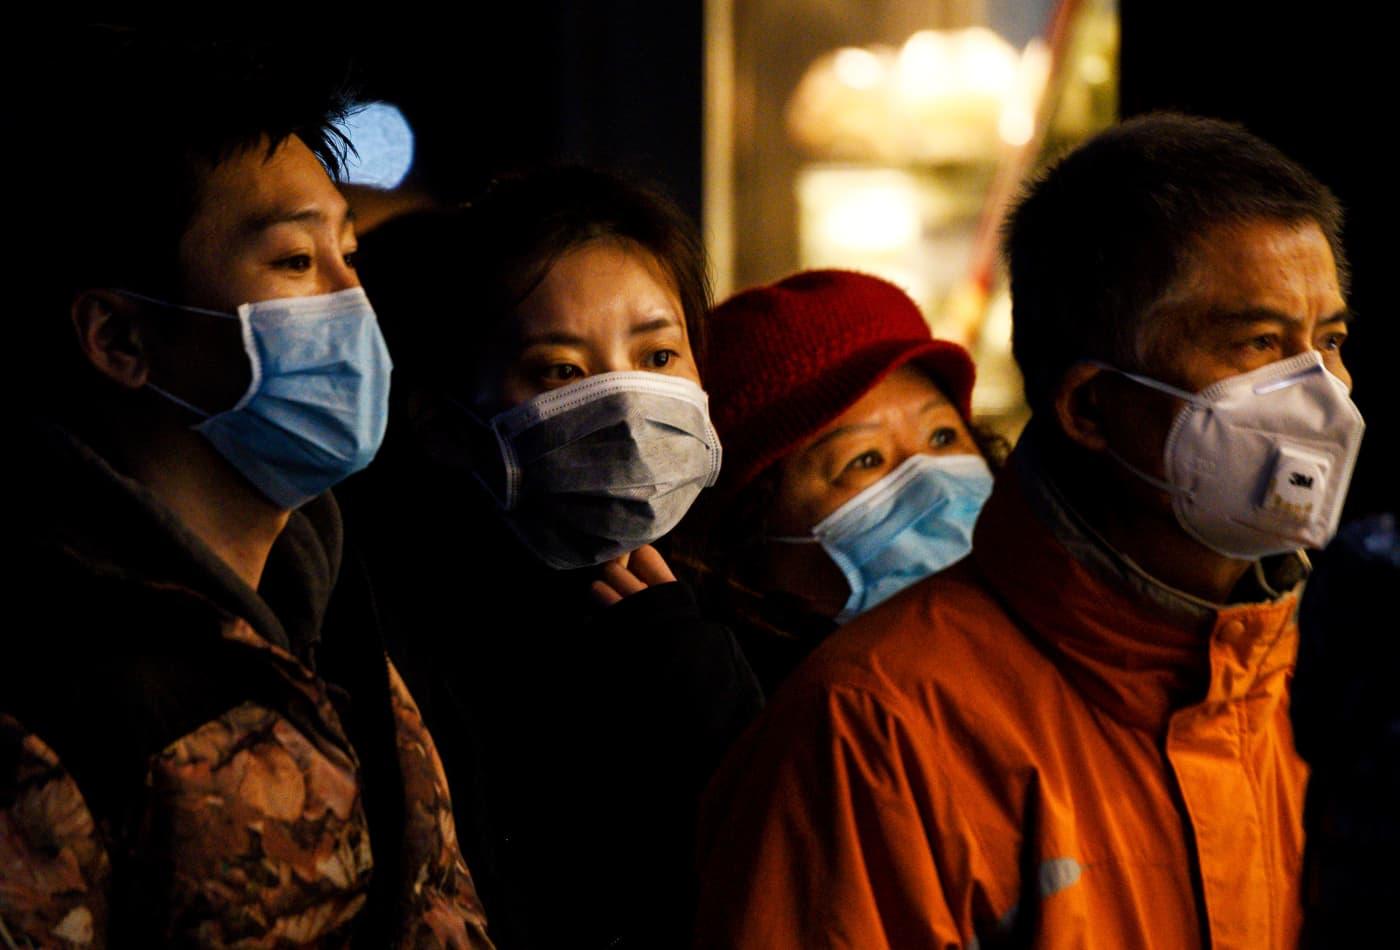 Coronavirus could impact 5 million companies worldwide, new research shows